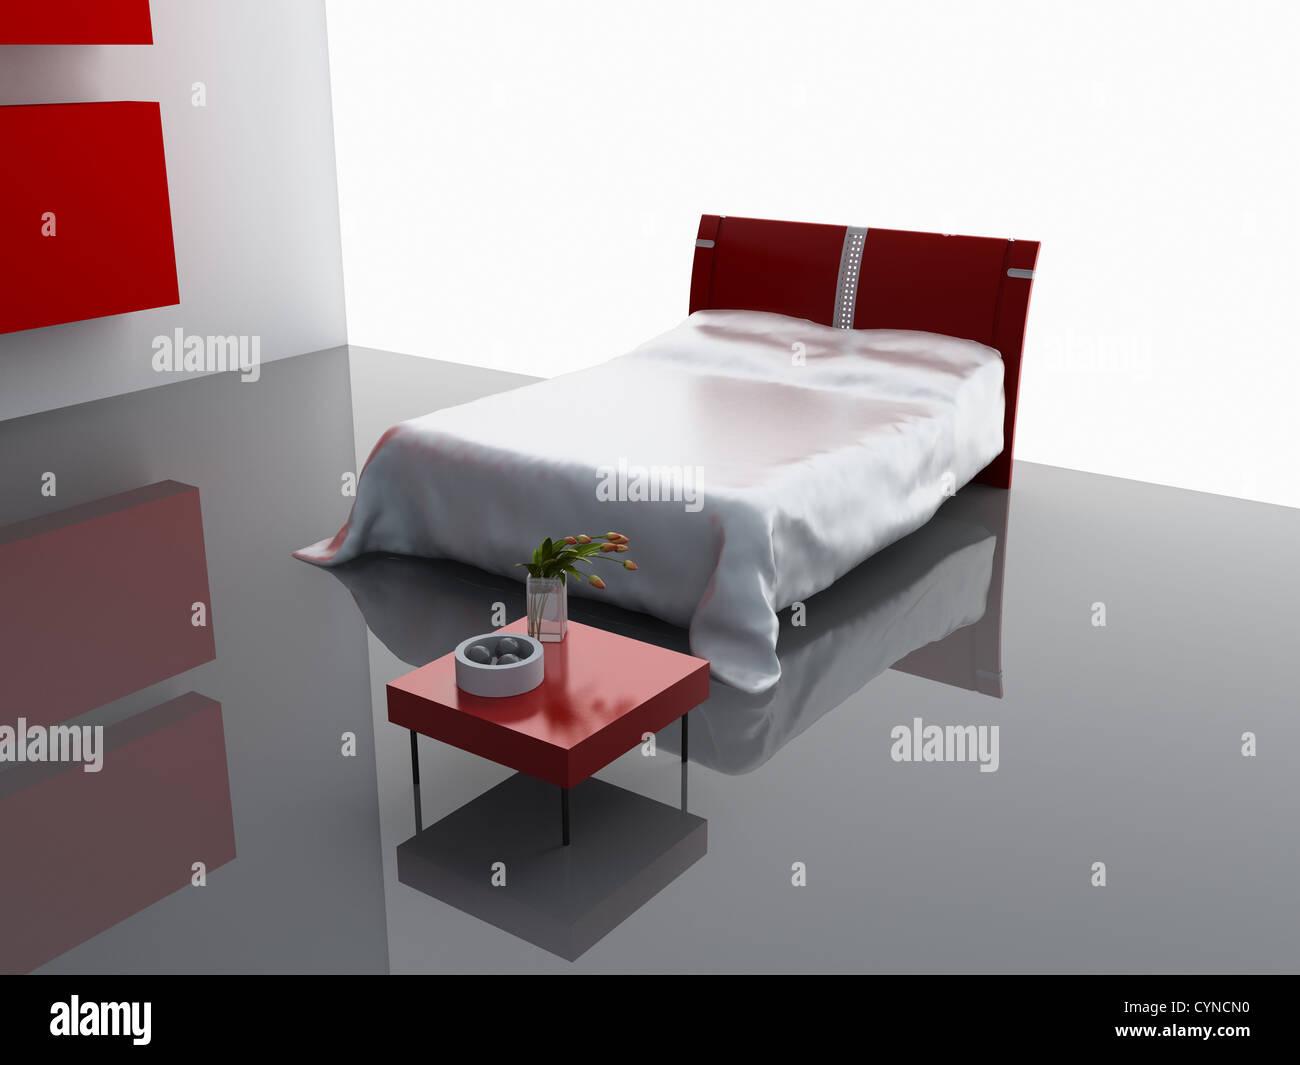 modern bedroom interior design (computer - generated image) - Stock Image